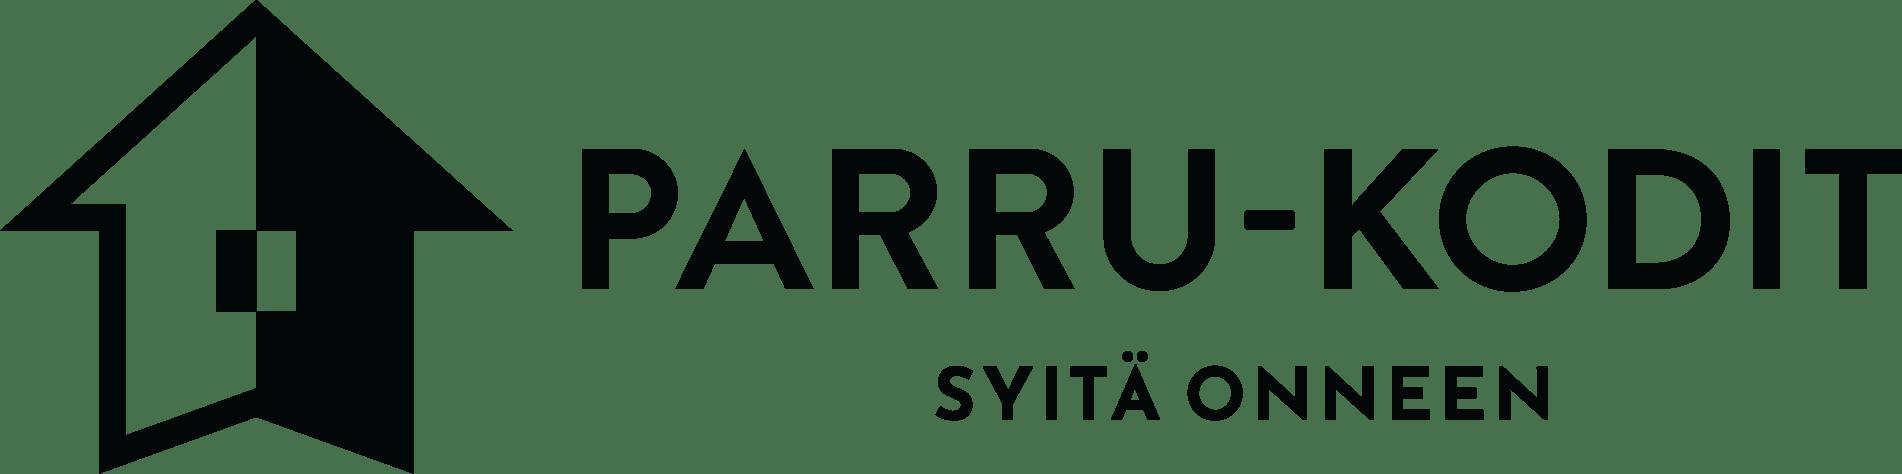 Parru-Kodit / Parru-Yhtiöt